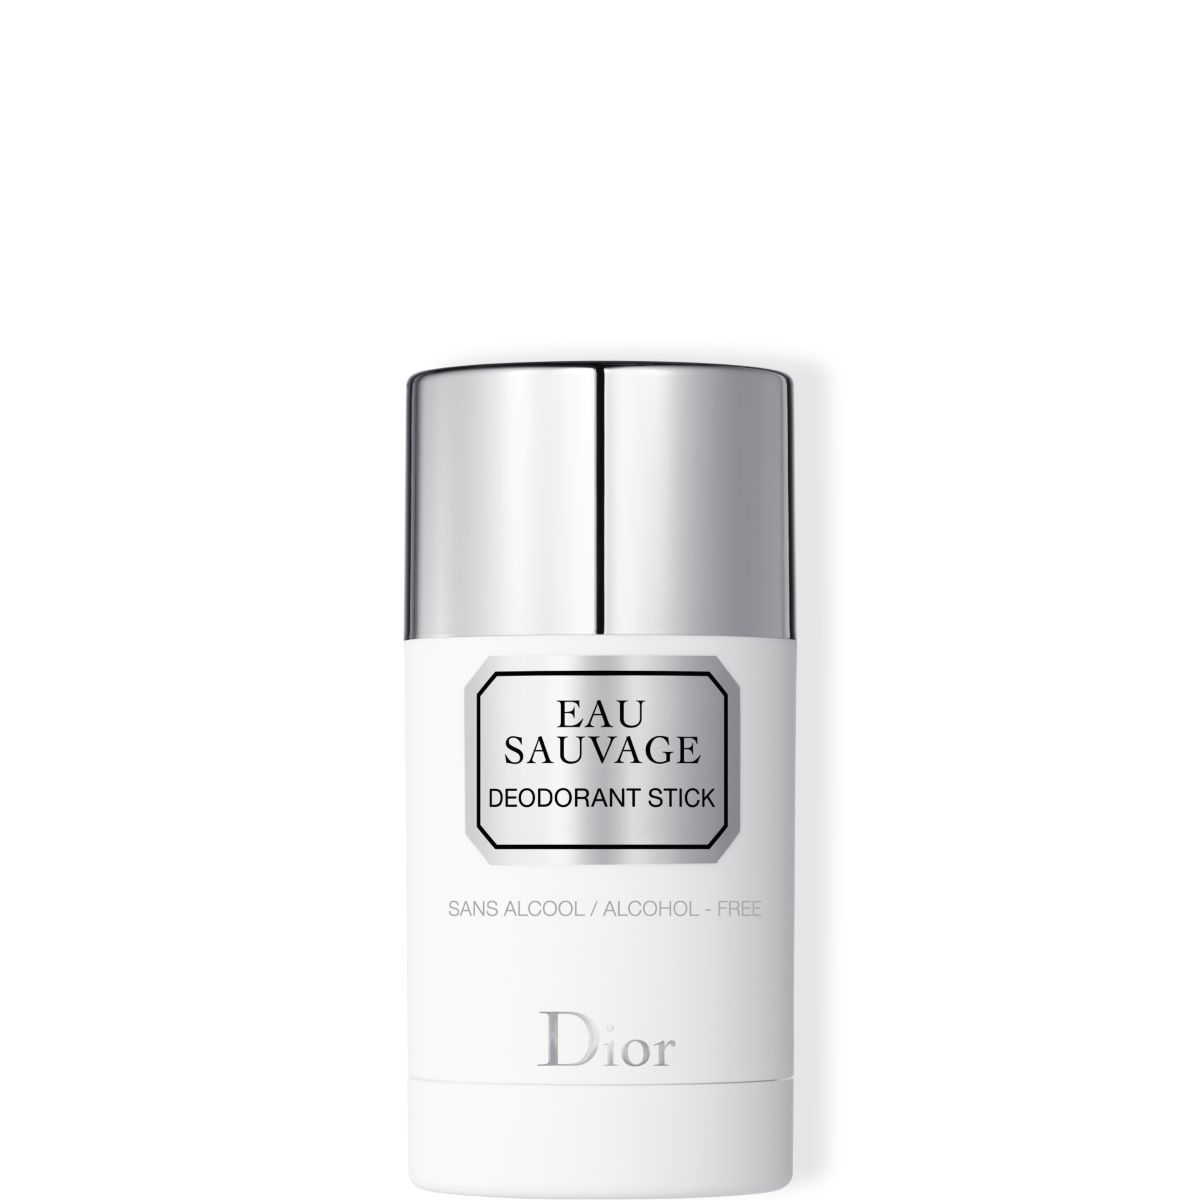 Dior - Eau Sauvage - Déodorant Stick 75 g